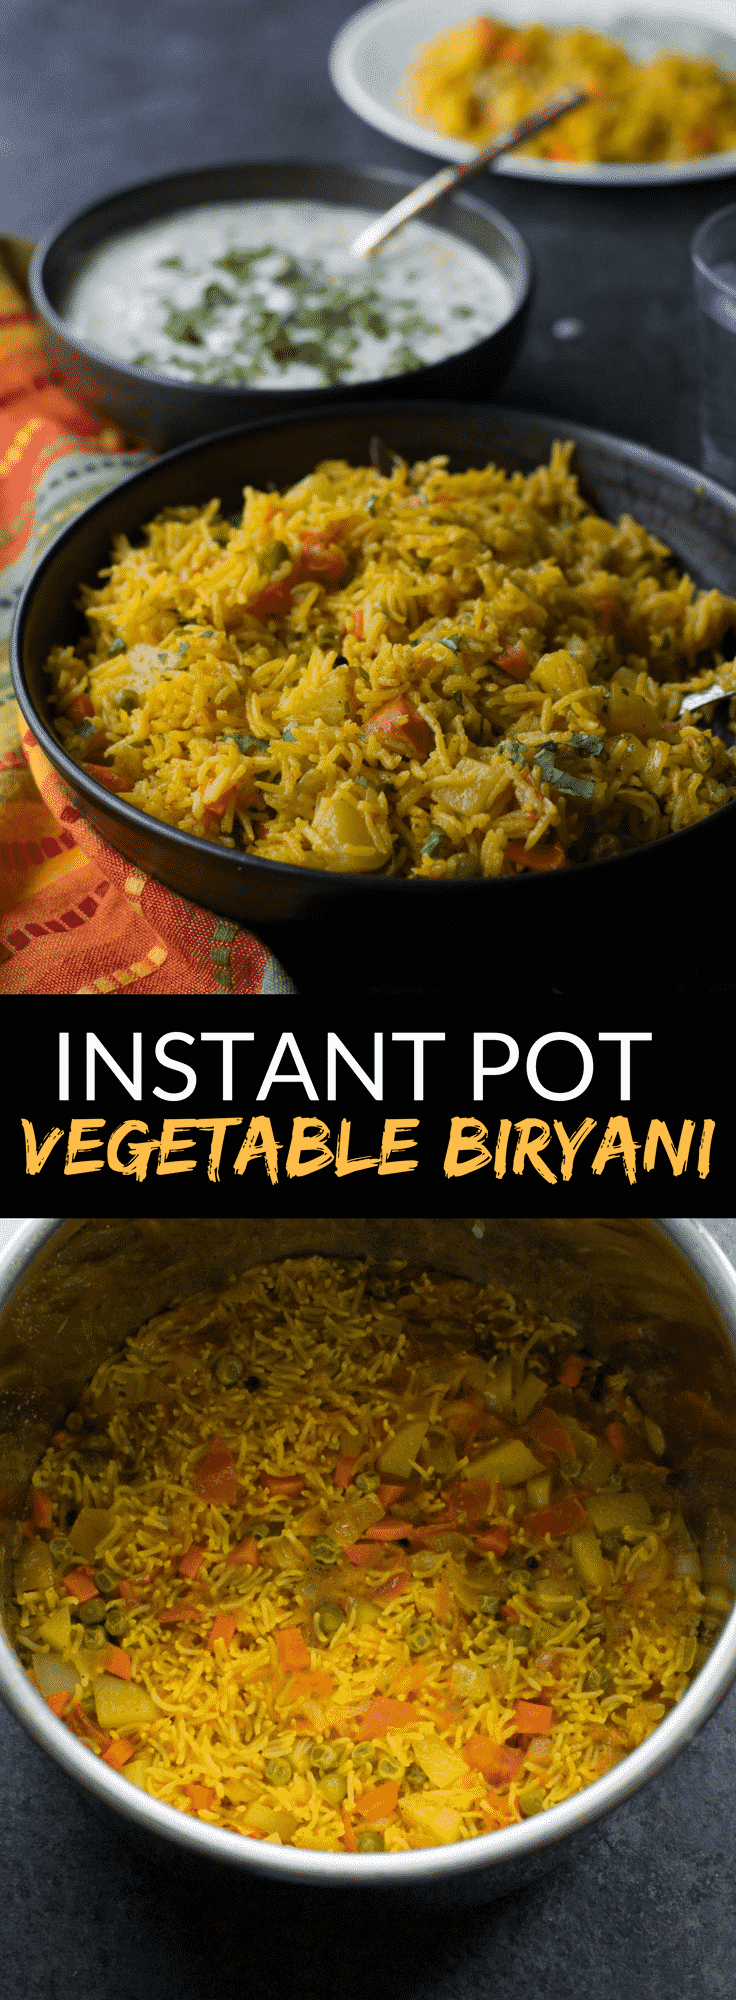 Instant Organic Garden : Instant pot vegetable biryani recipe how to make veg